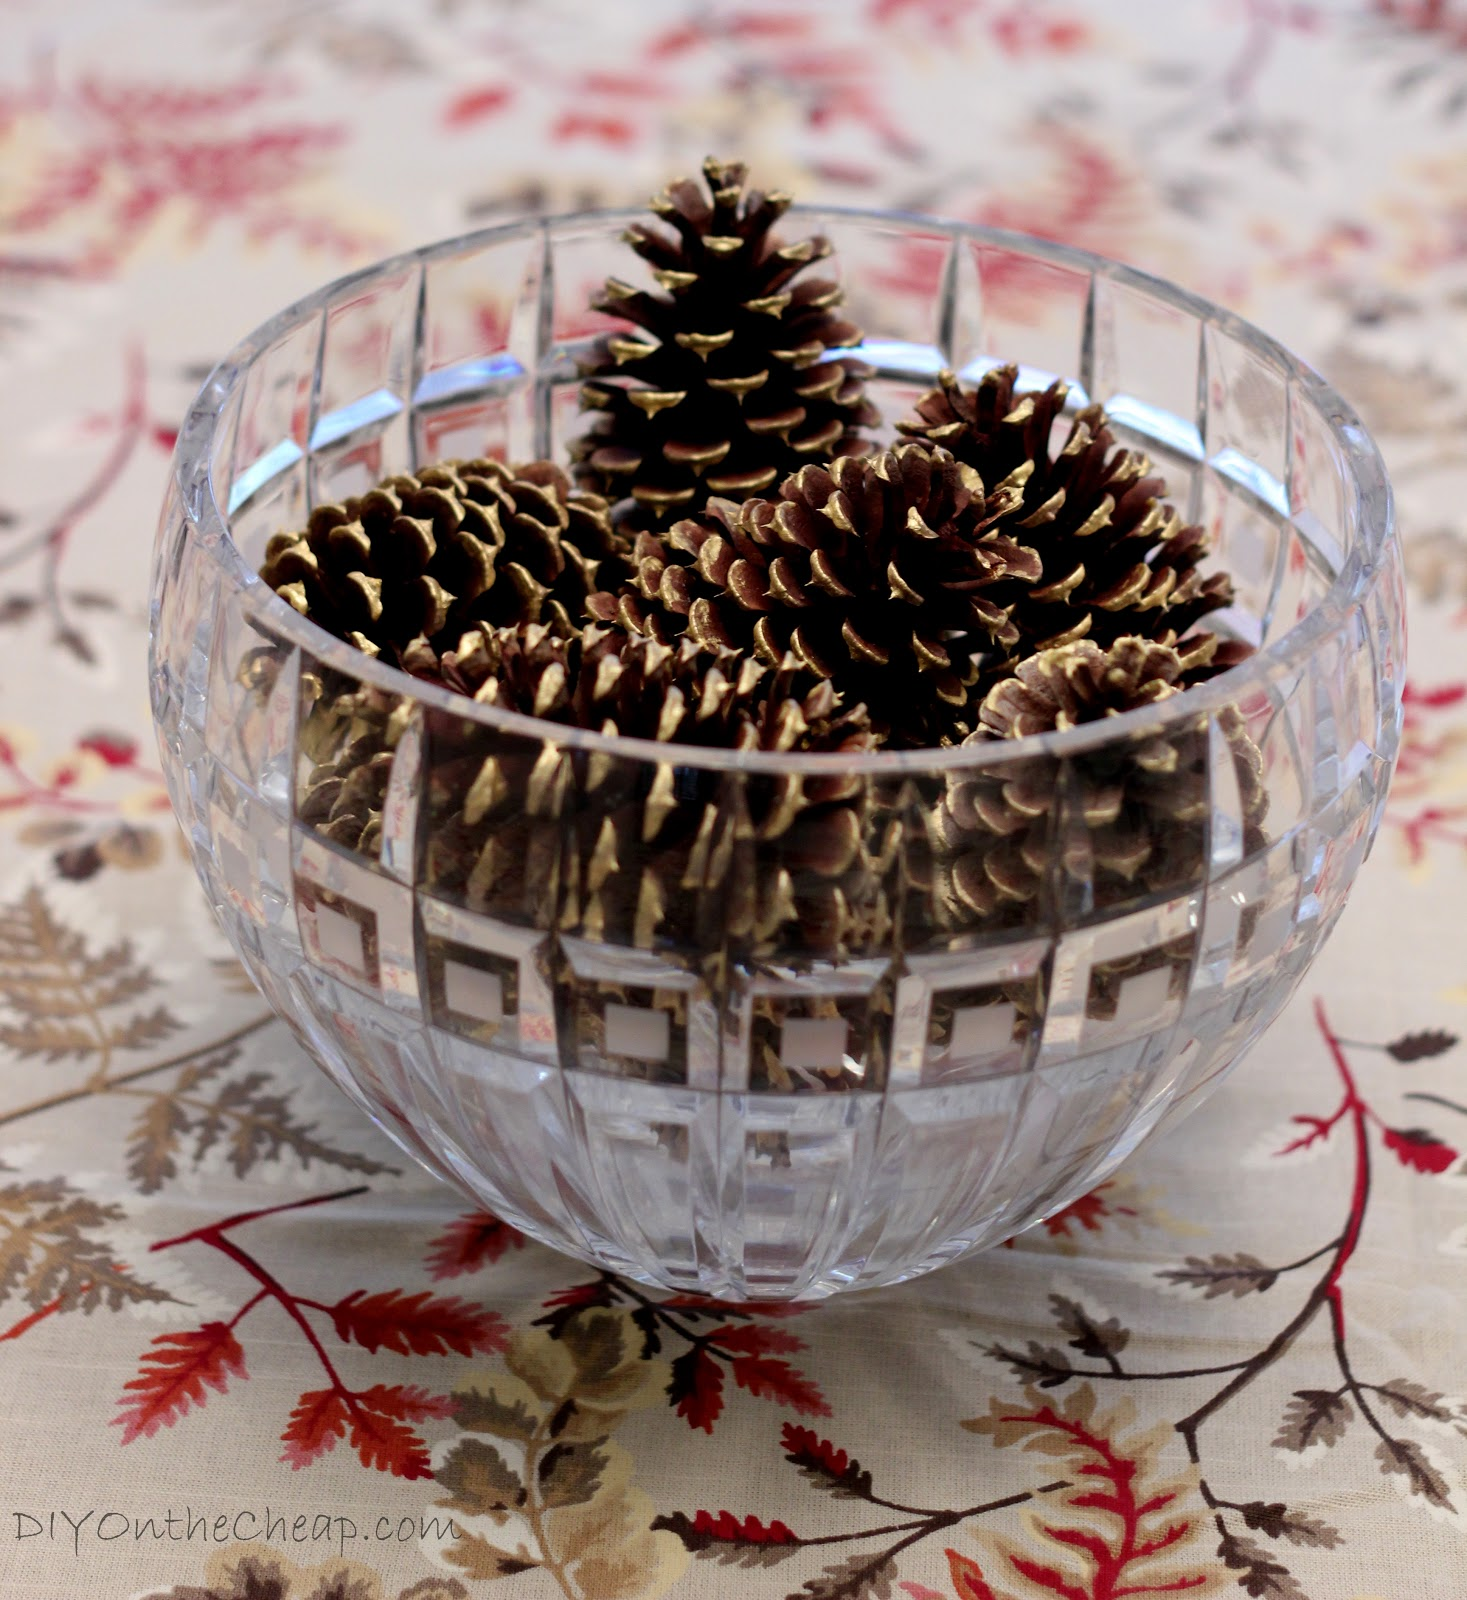 Pine Cone Bowl Gilded Pine Cone Centerpiece